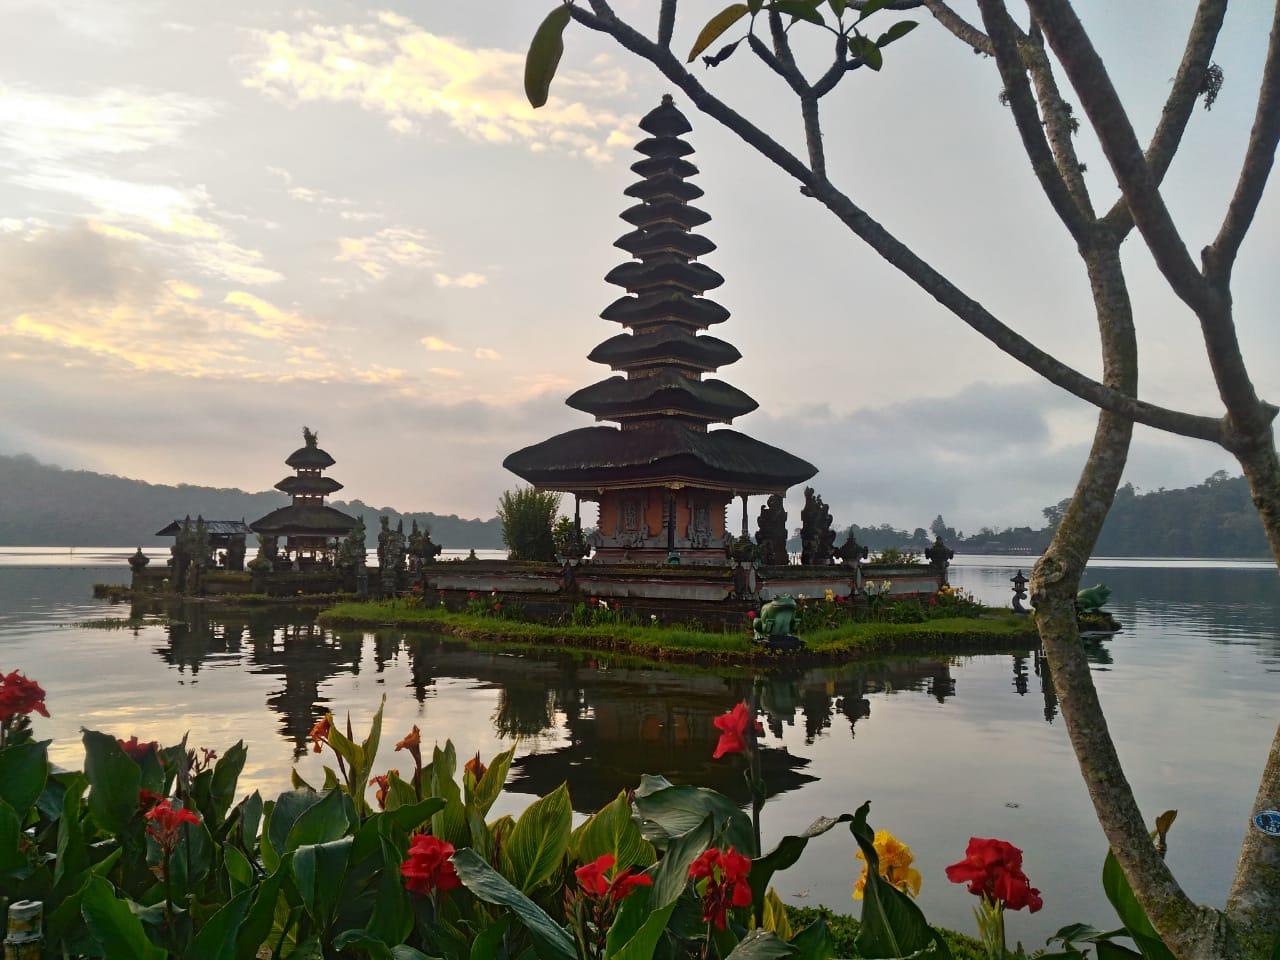 ulundanu temple